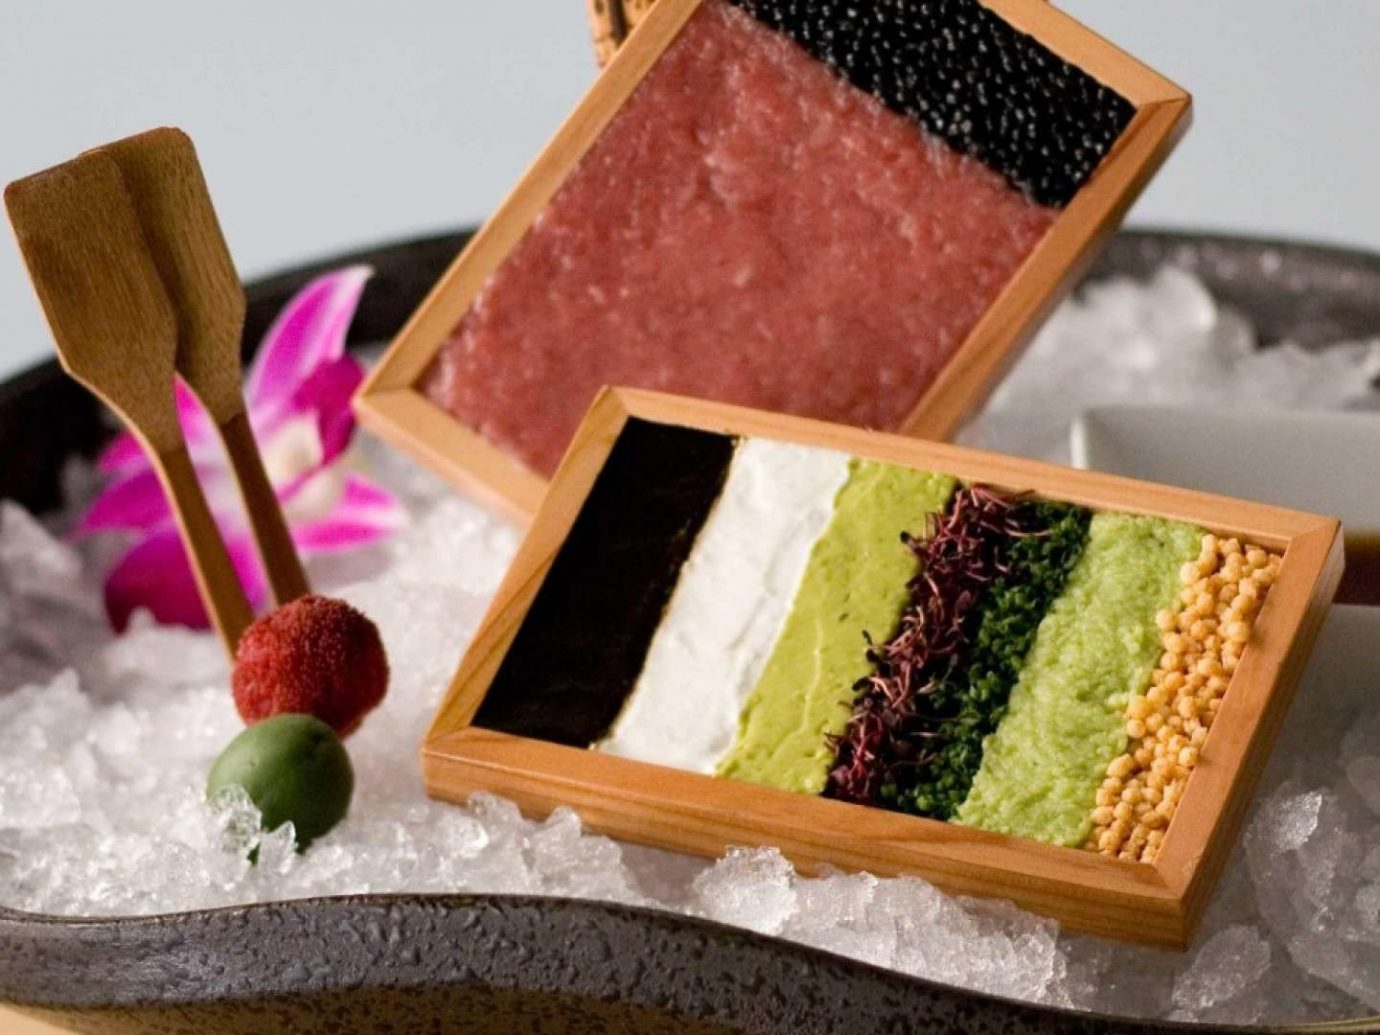 Food + Drink cake dish food chocolate meal cuisine asian food lunch japanese cuisine dessert